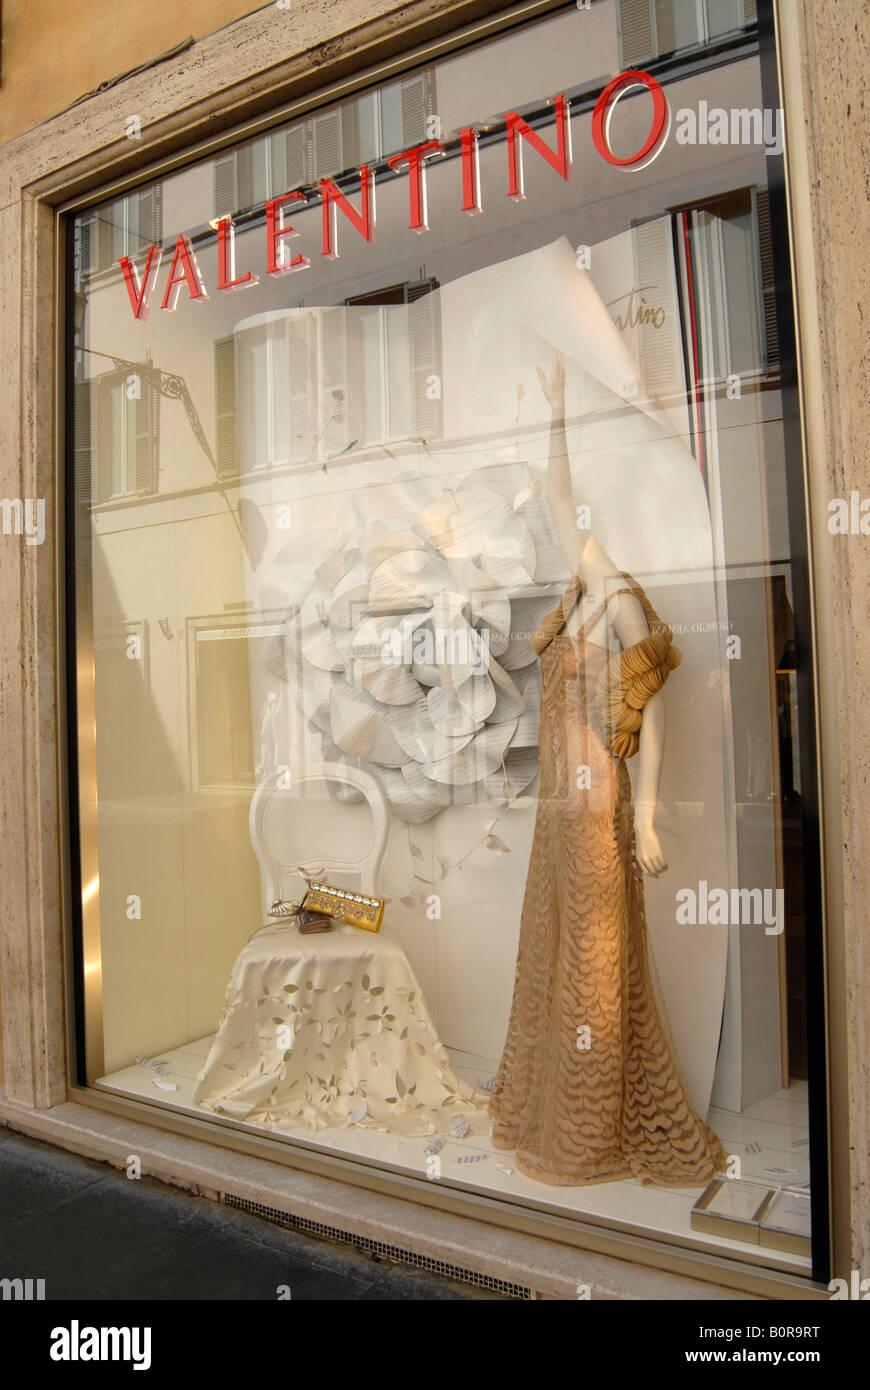 window of Valentino store, via Condotti, Roma, Italy - Stock Image